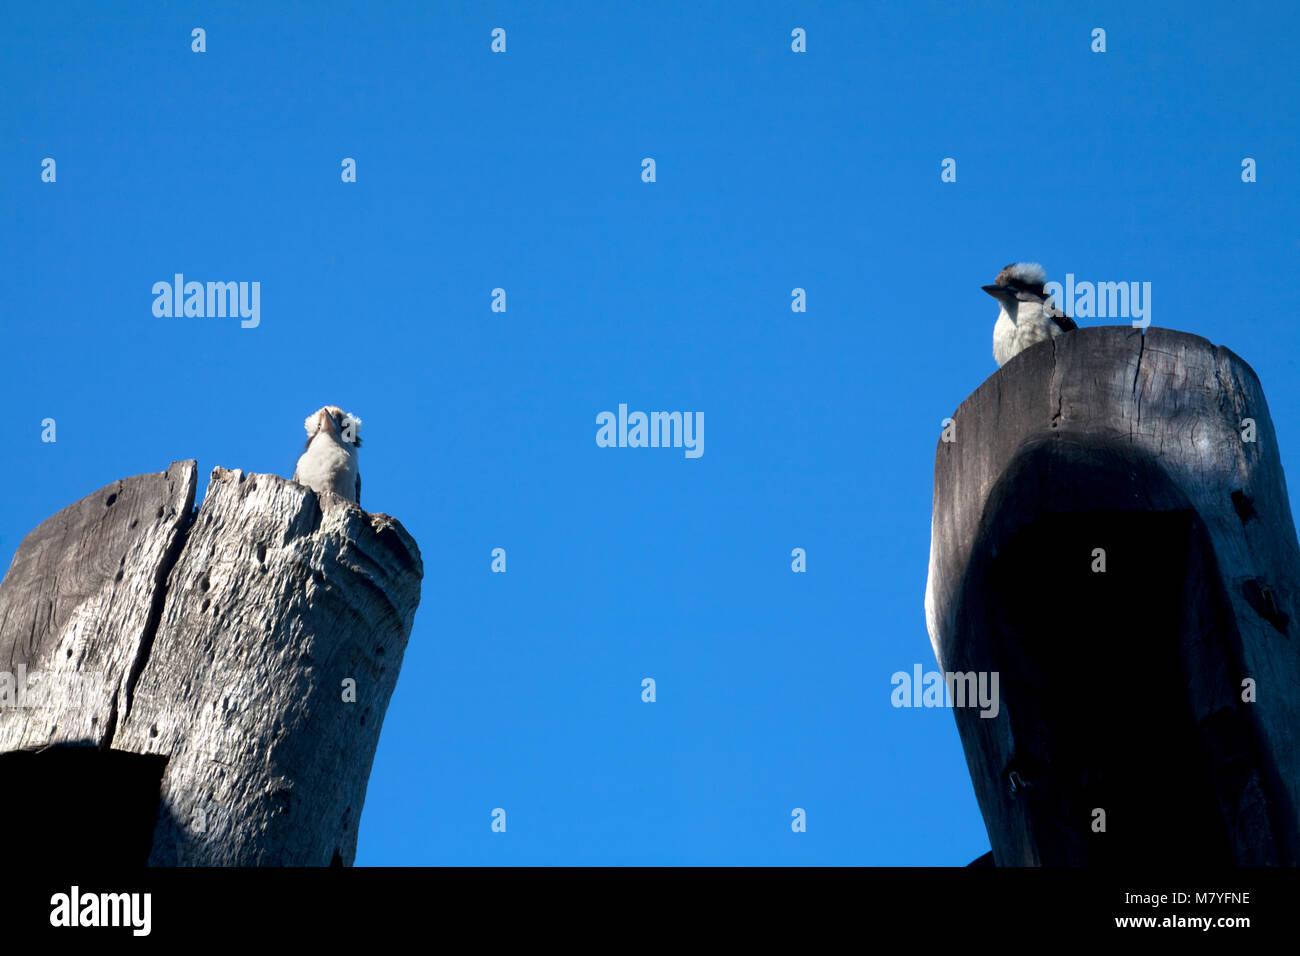 kookaburra headland park middle head peninsular mosman sydney new south wales australia - Stock Image